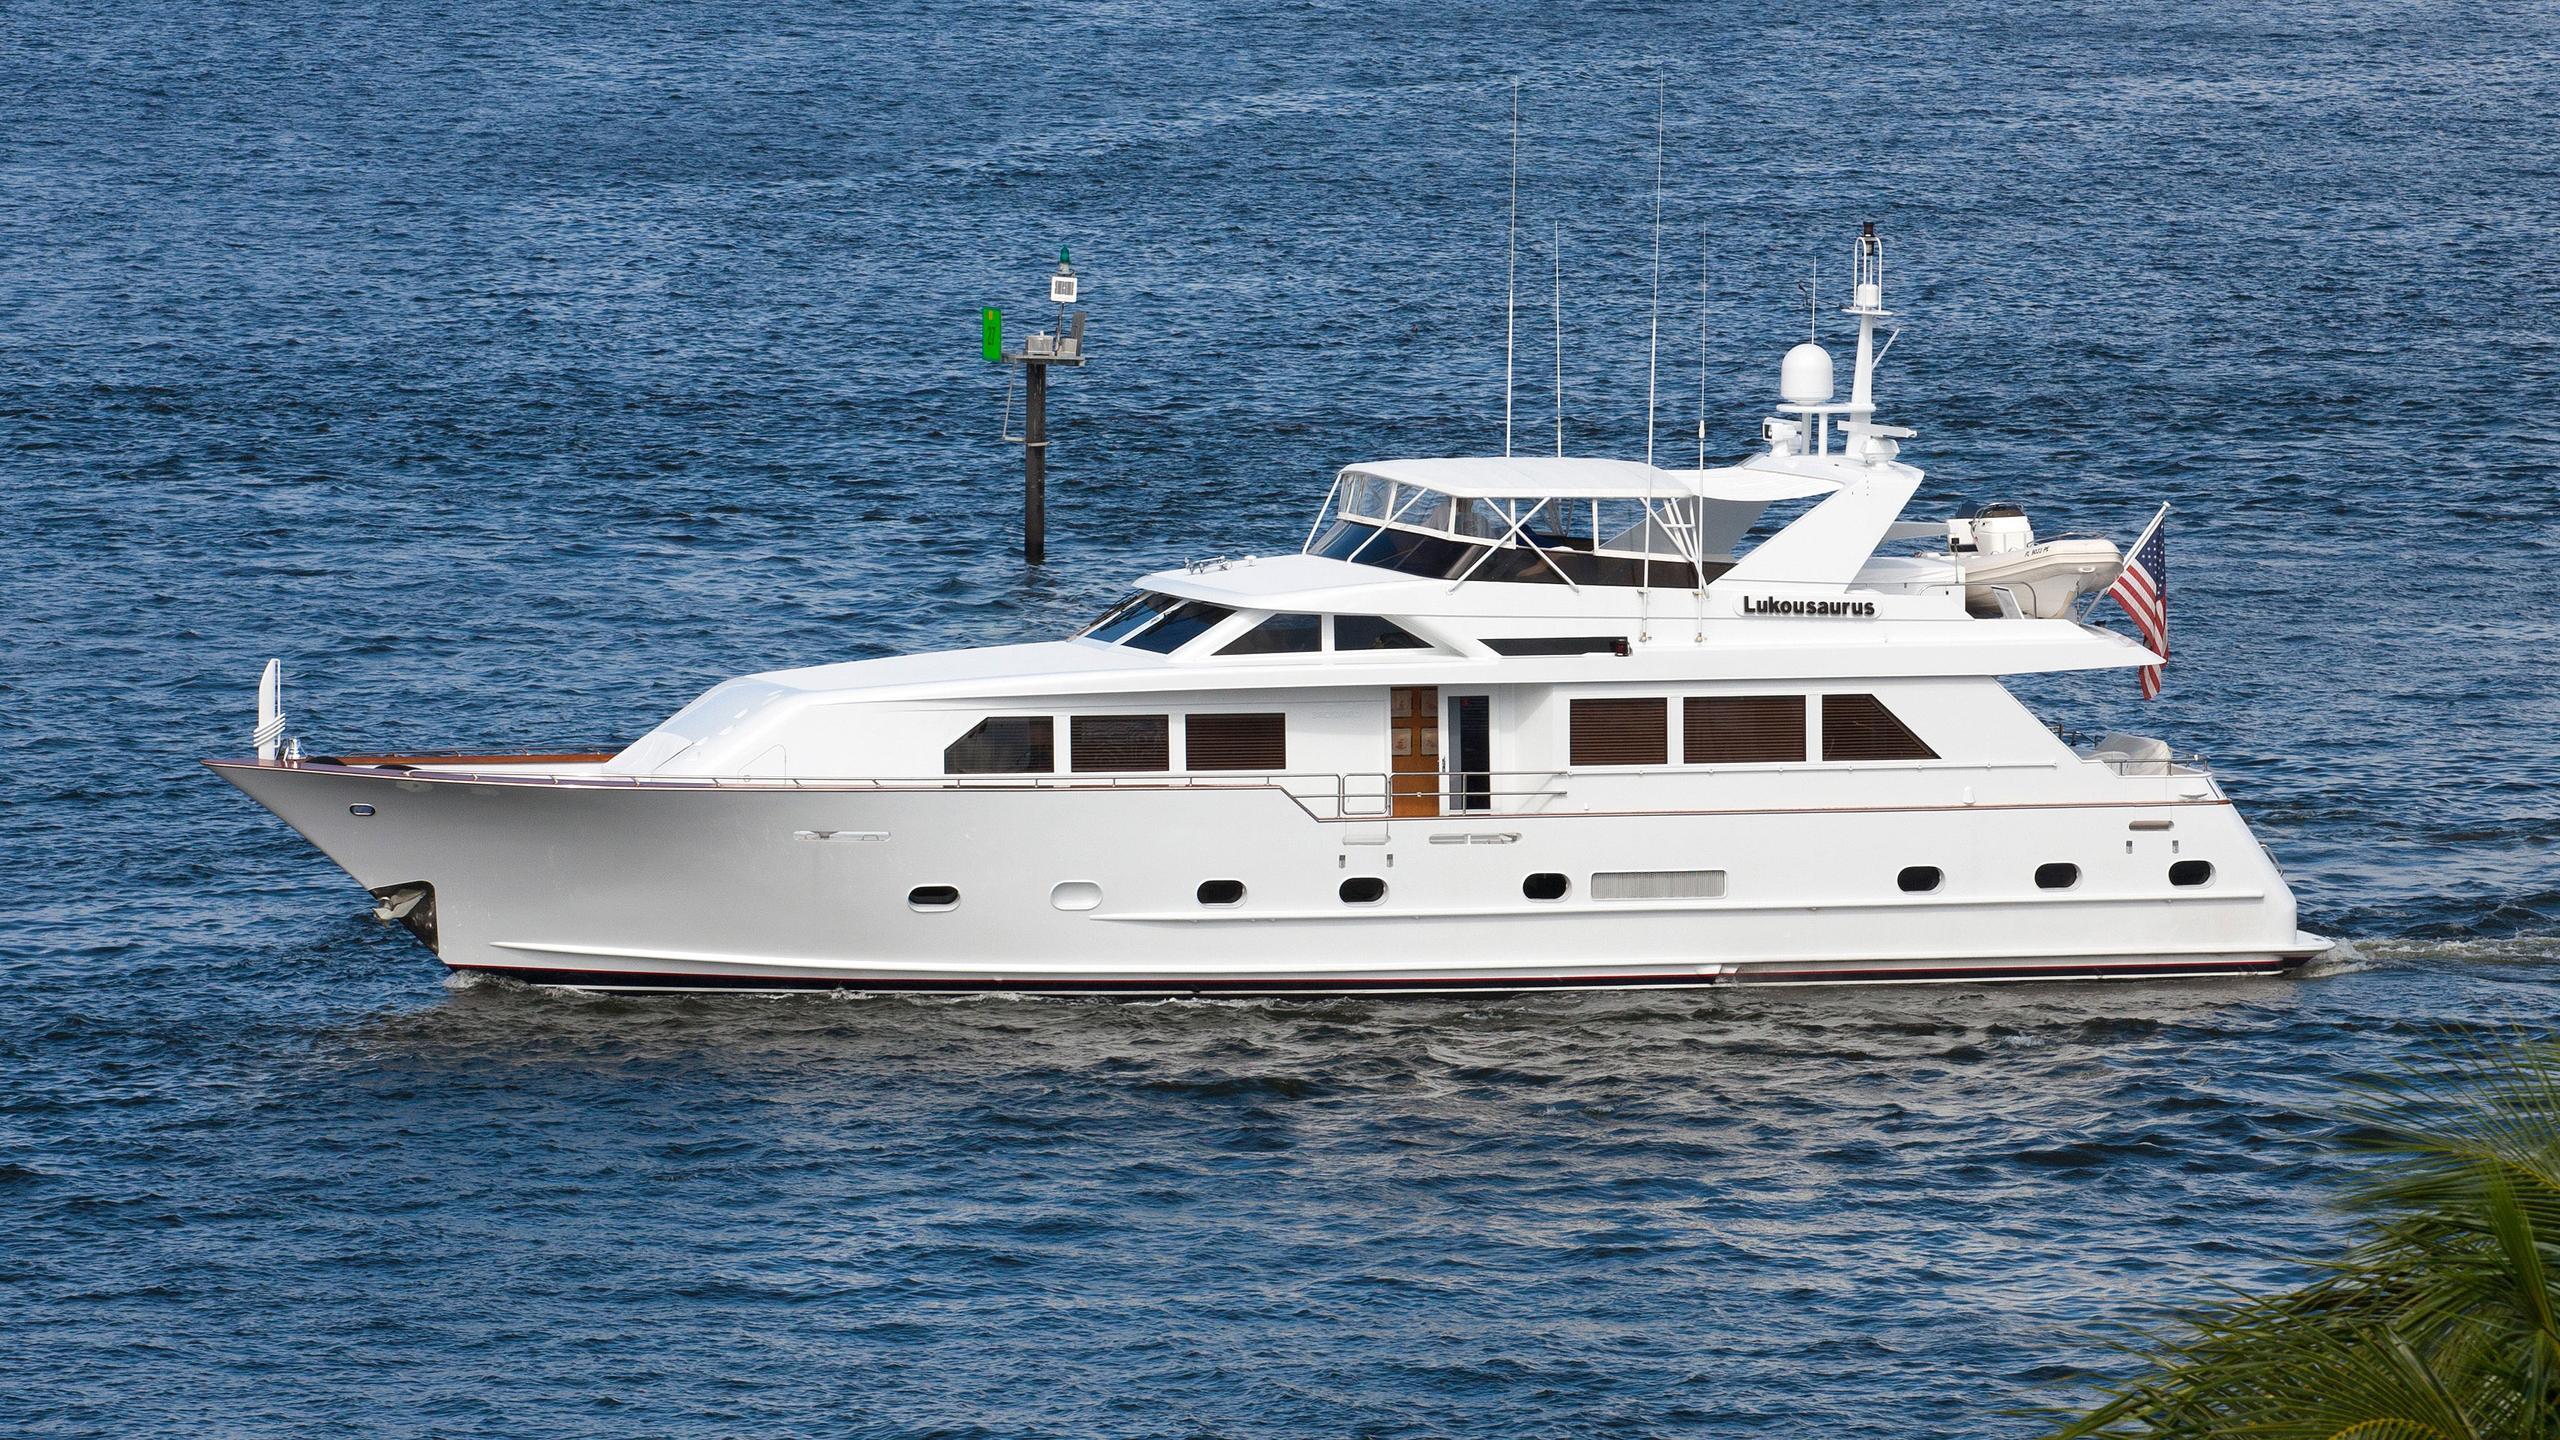 unleashed-dahvin-motor-yacht-broward-1995-27m-profile